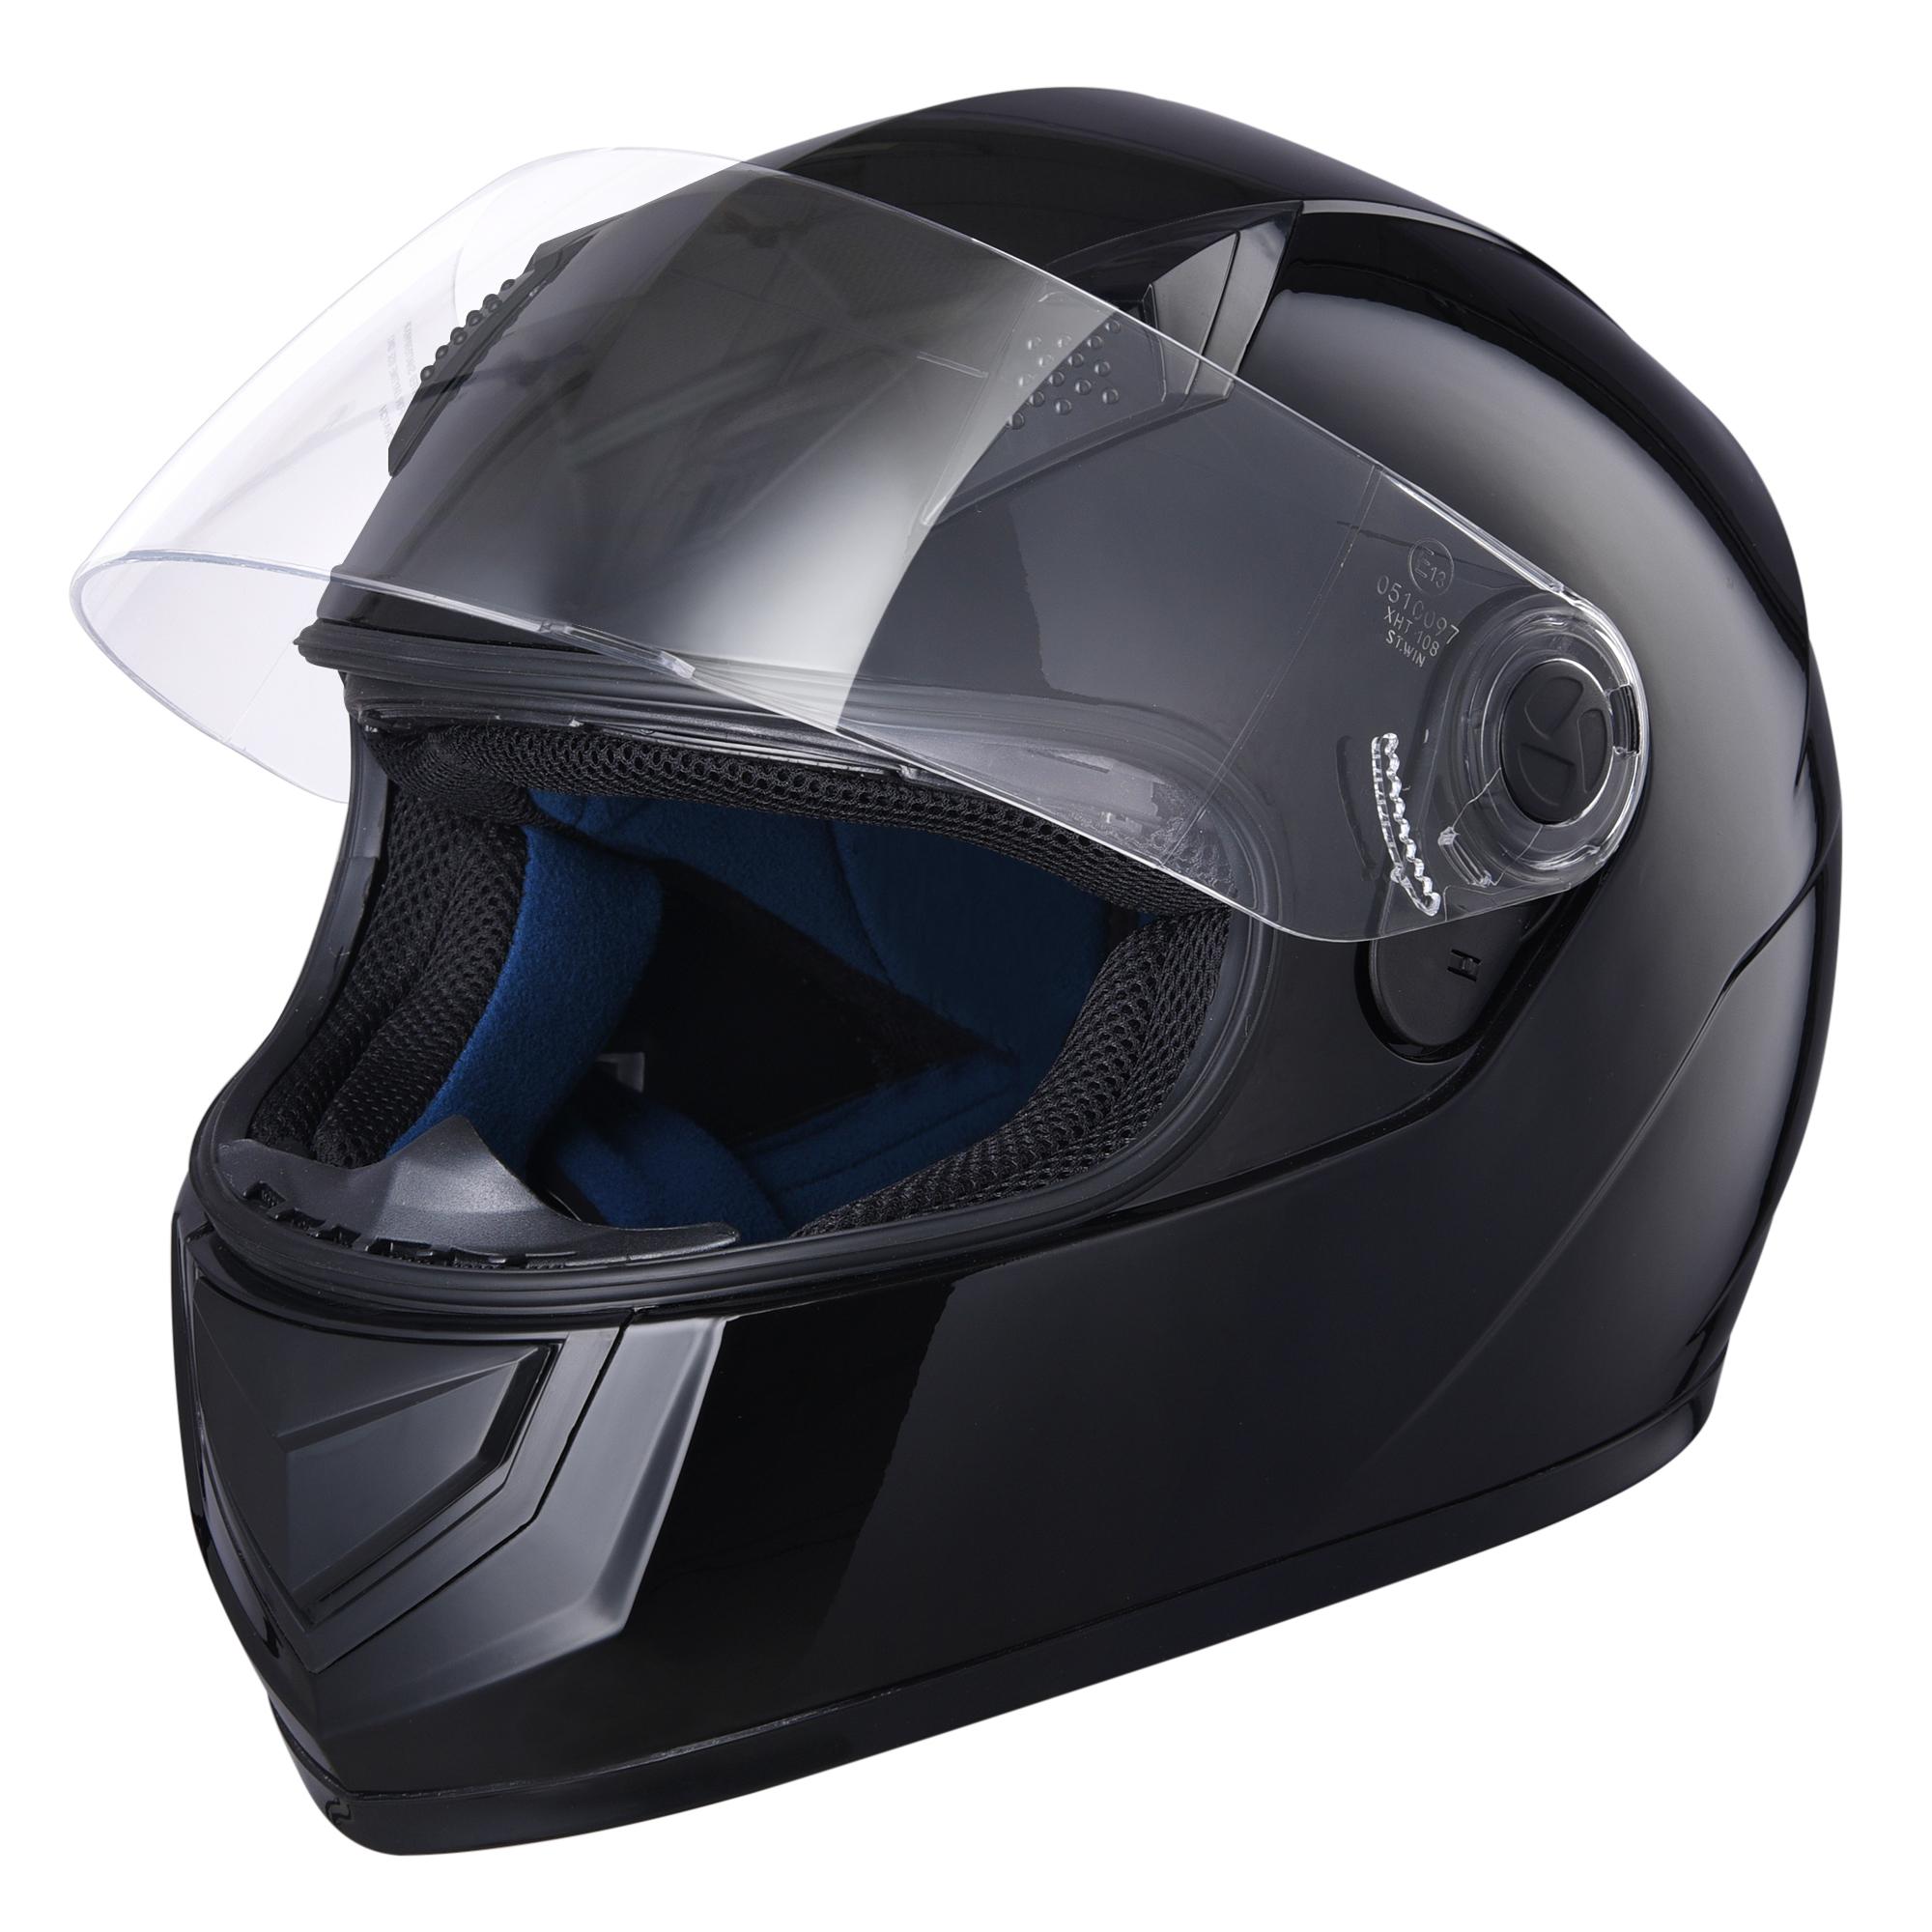 miniature 50 - AHR K12 Full Face Motorcycle Helmet DOT Air Vents Clear Visor Racing S M L XL